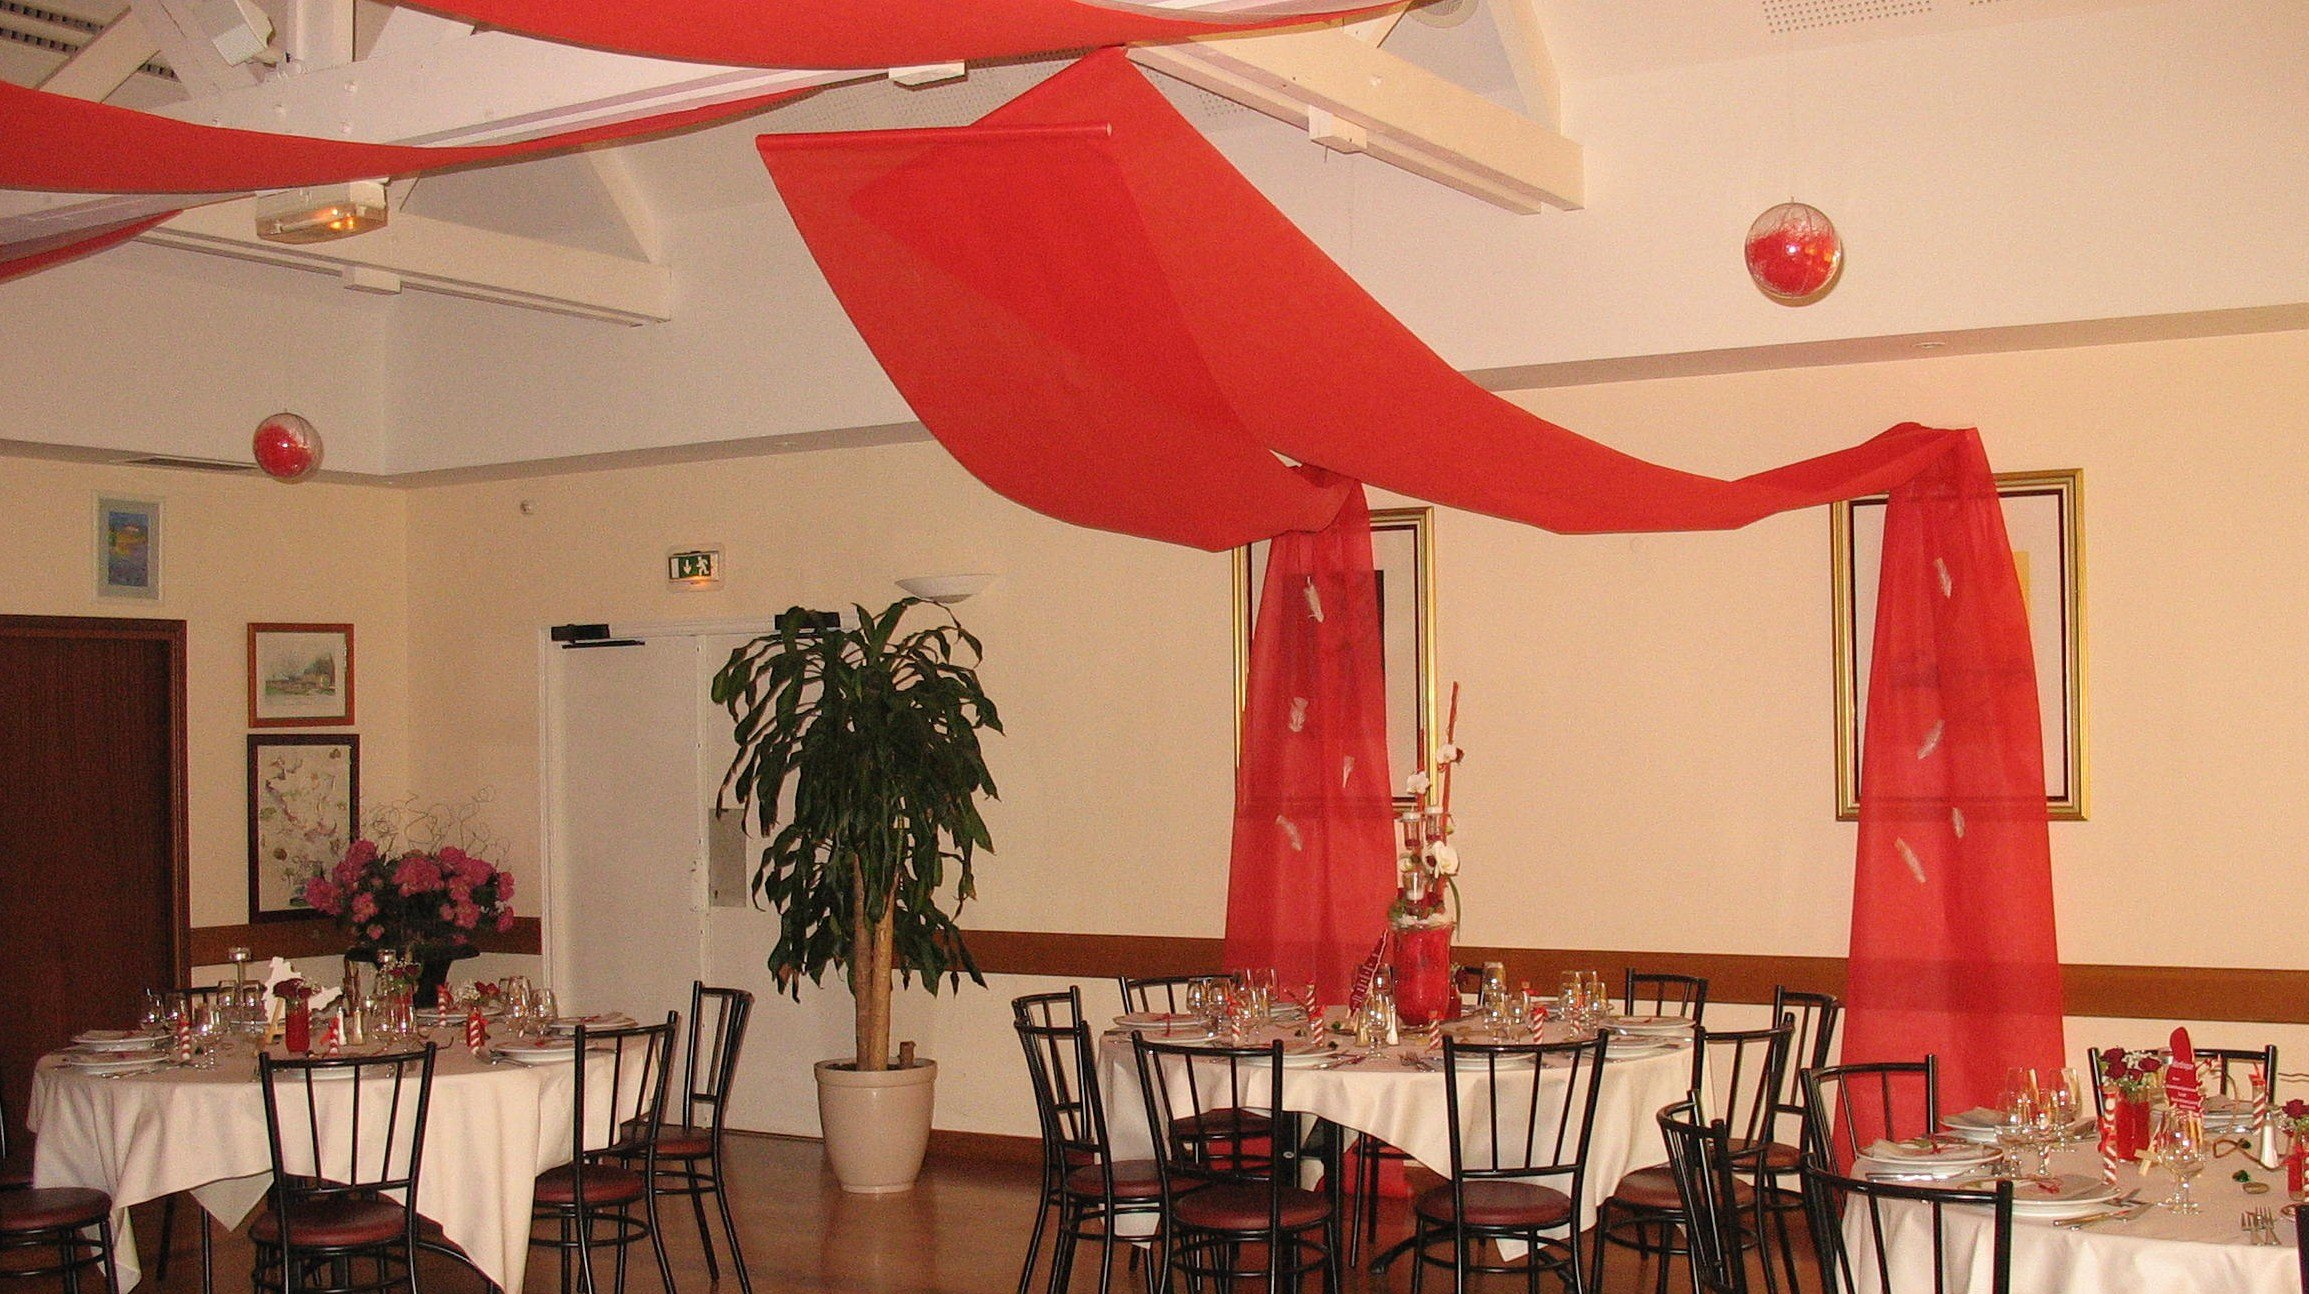 drap rouge - Drap Plafond Mariage